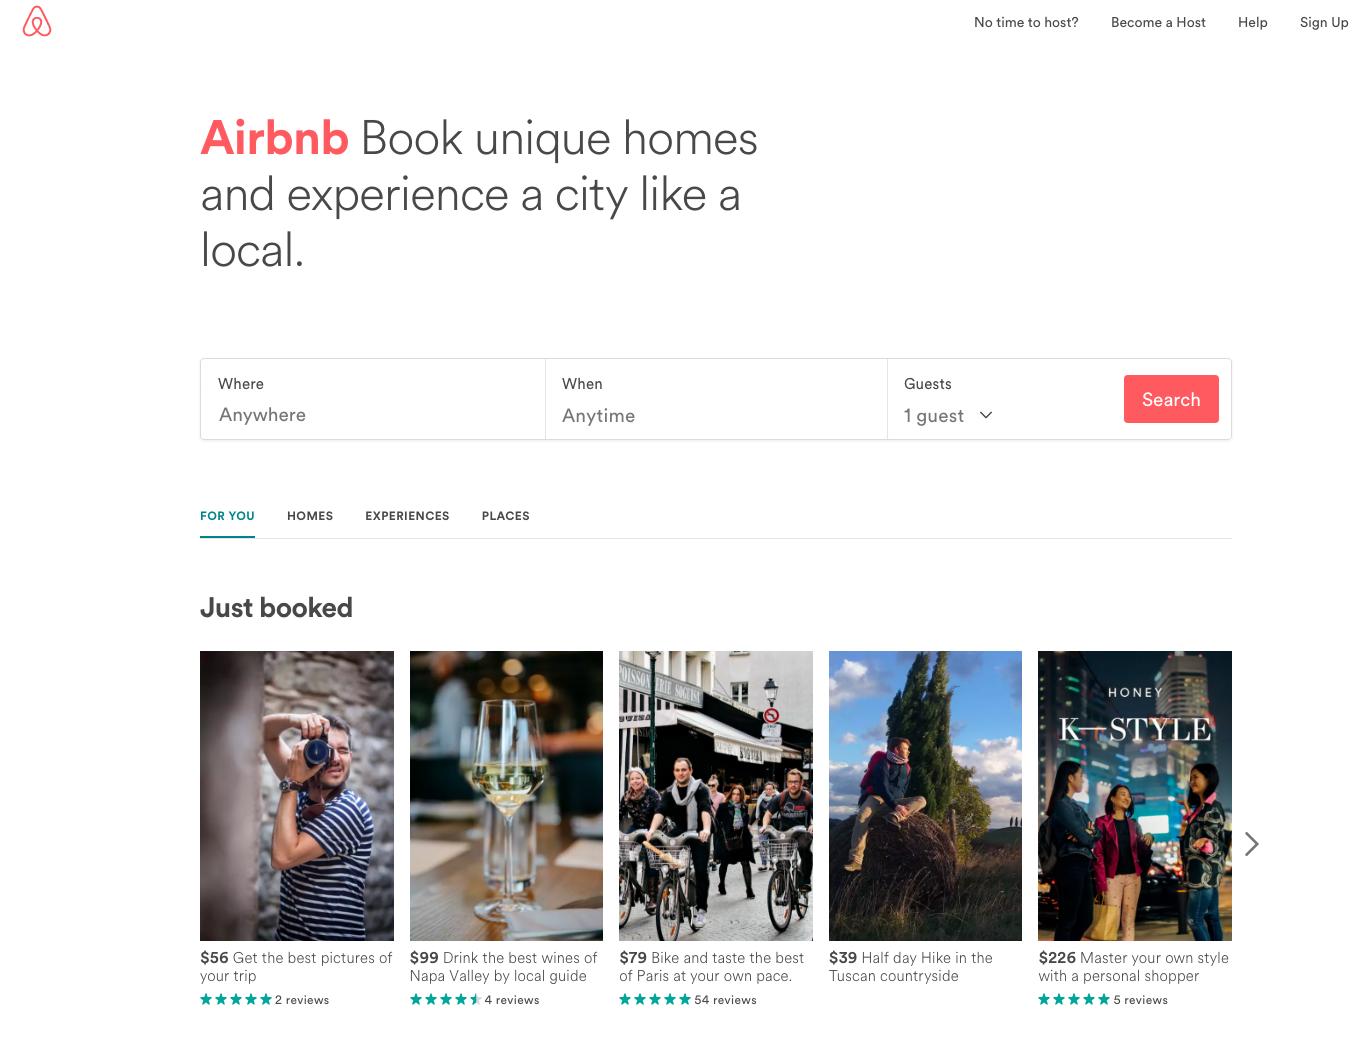 制作的Airbnb - 首页 - update.png